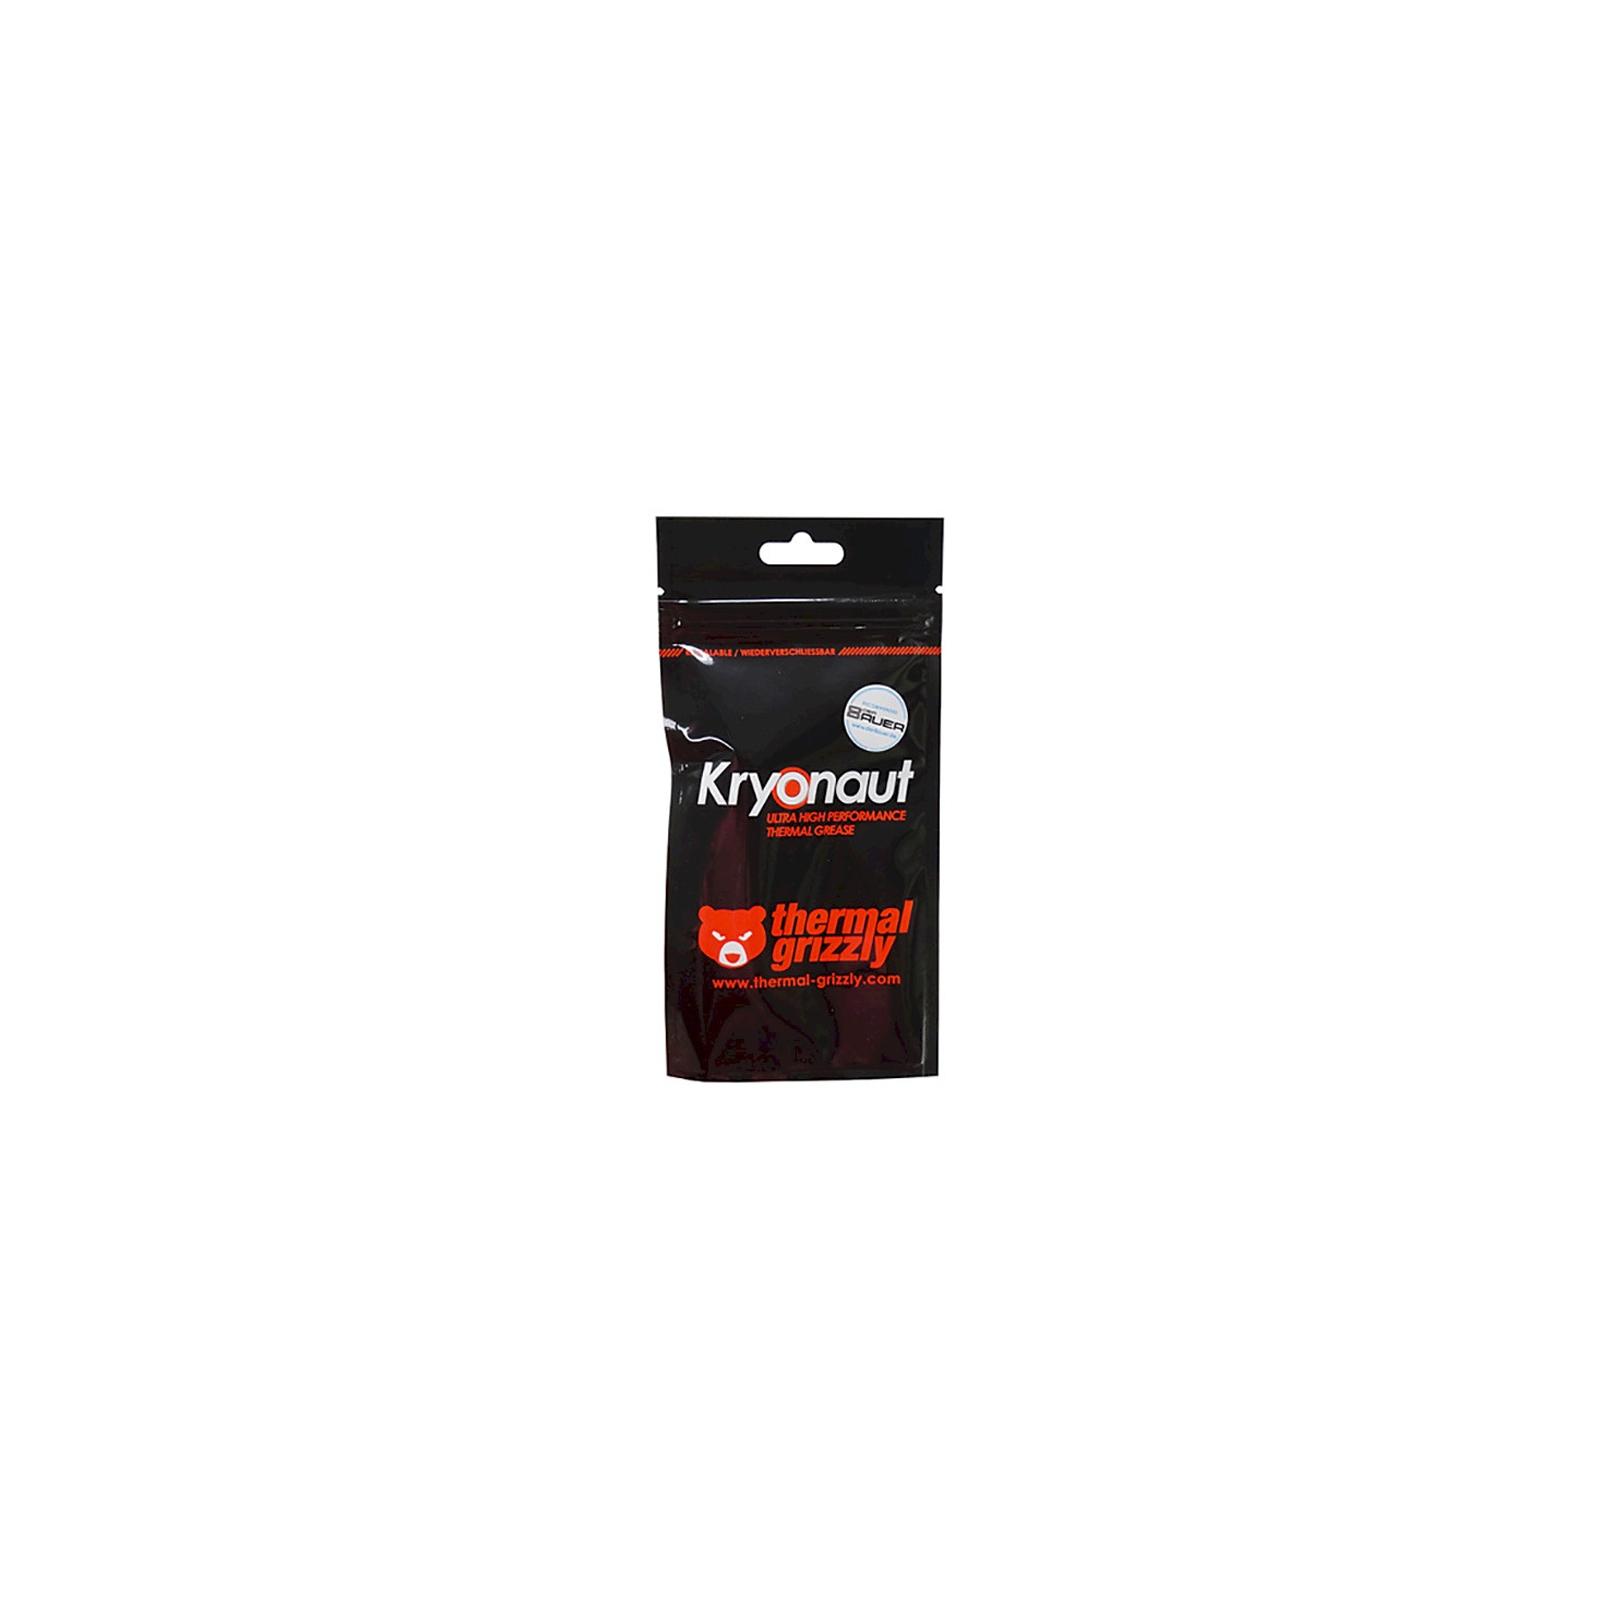 Термопаста Thermal Grizzly Kryonaut 1g (TG-K-001-RS) изображение 3